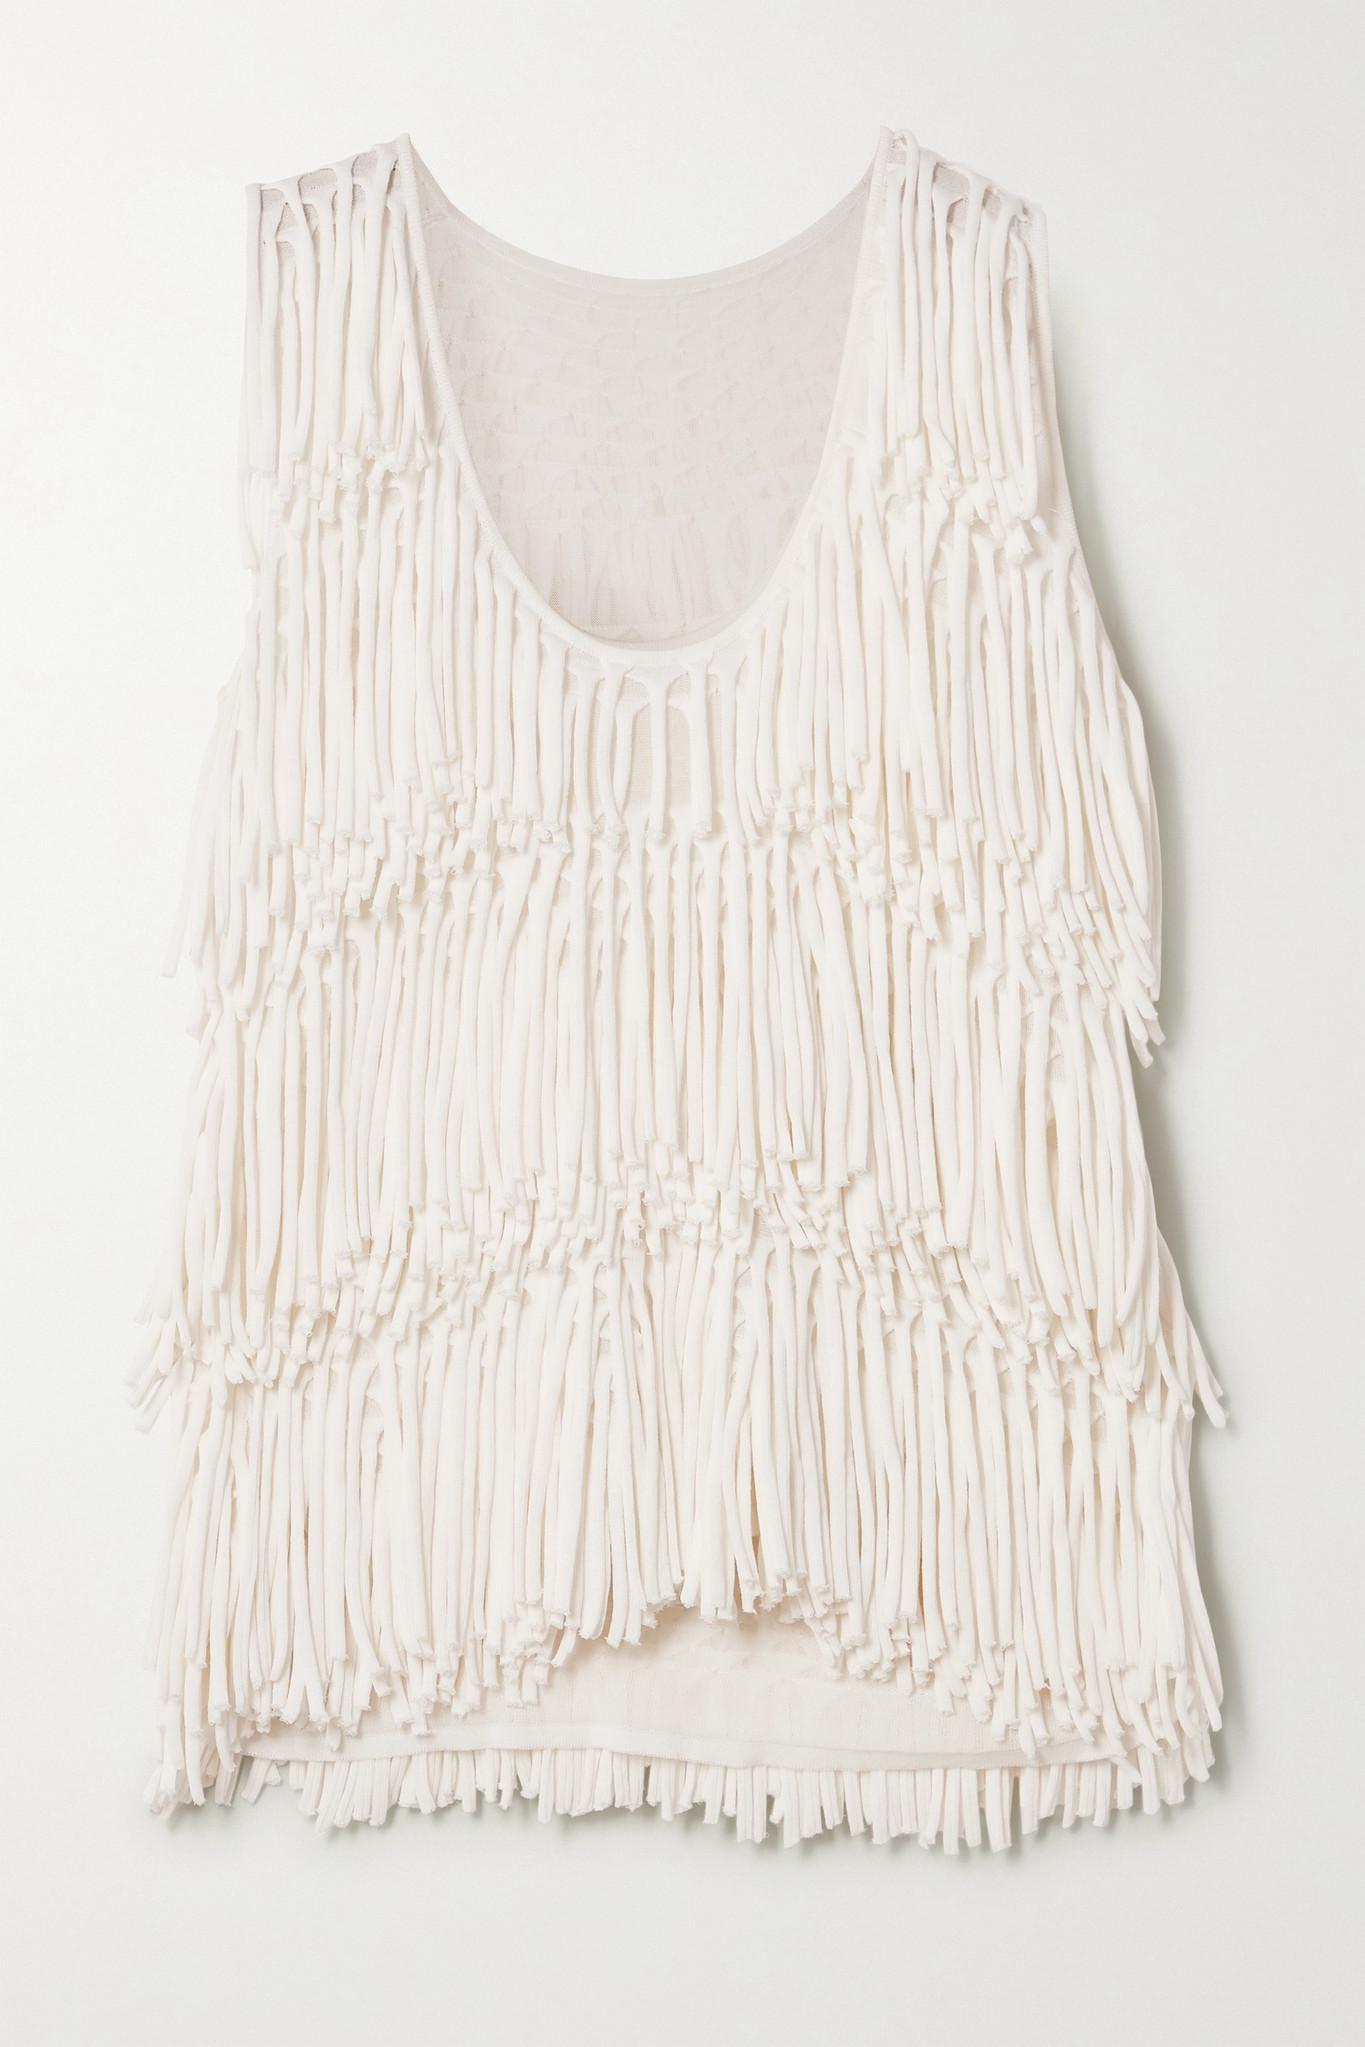 BOTTEGA VENETA - Fringed Knitted Tank - White - x small